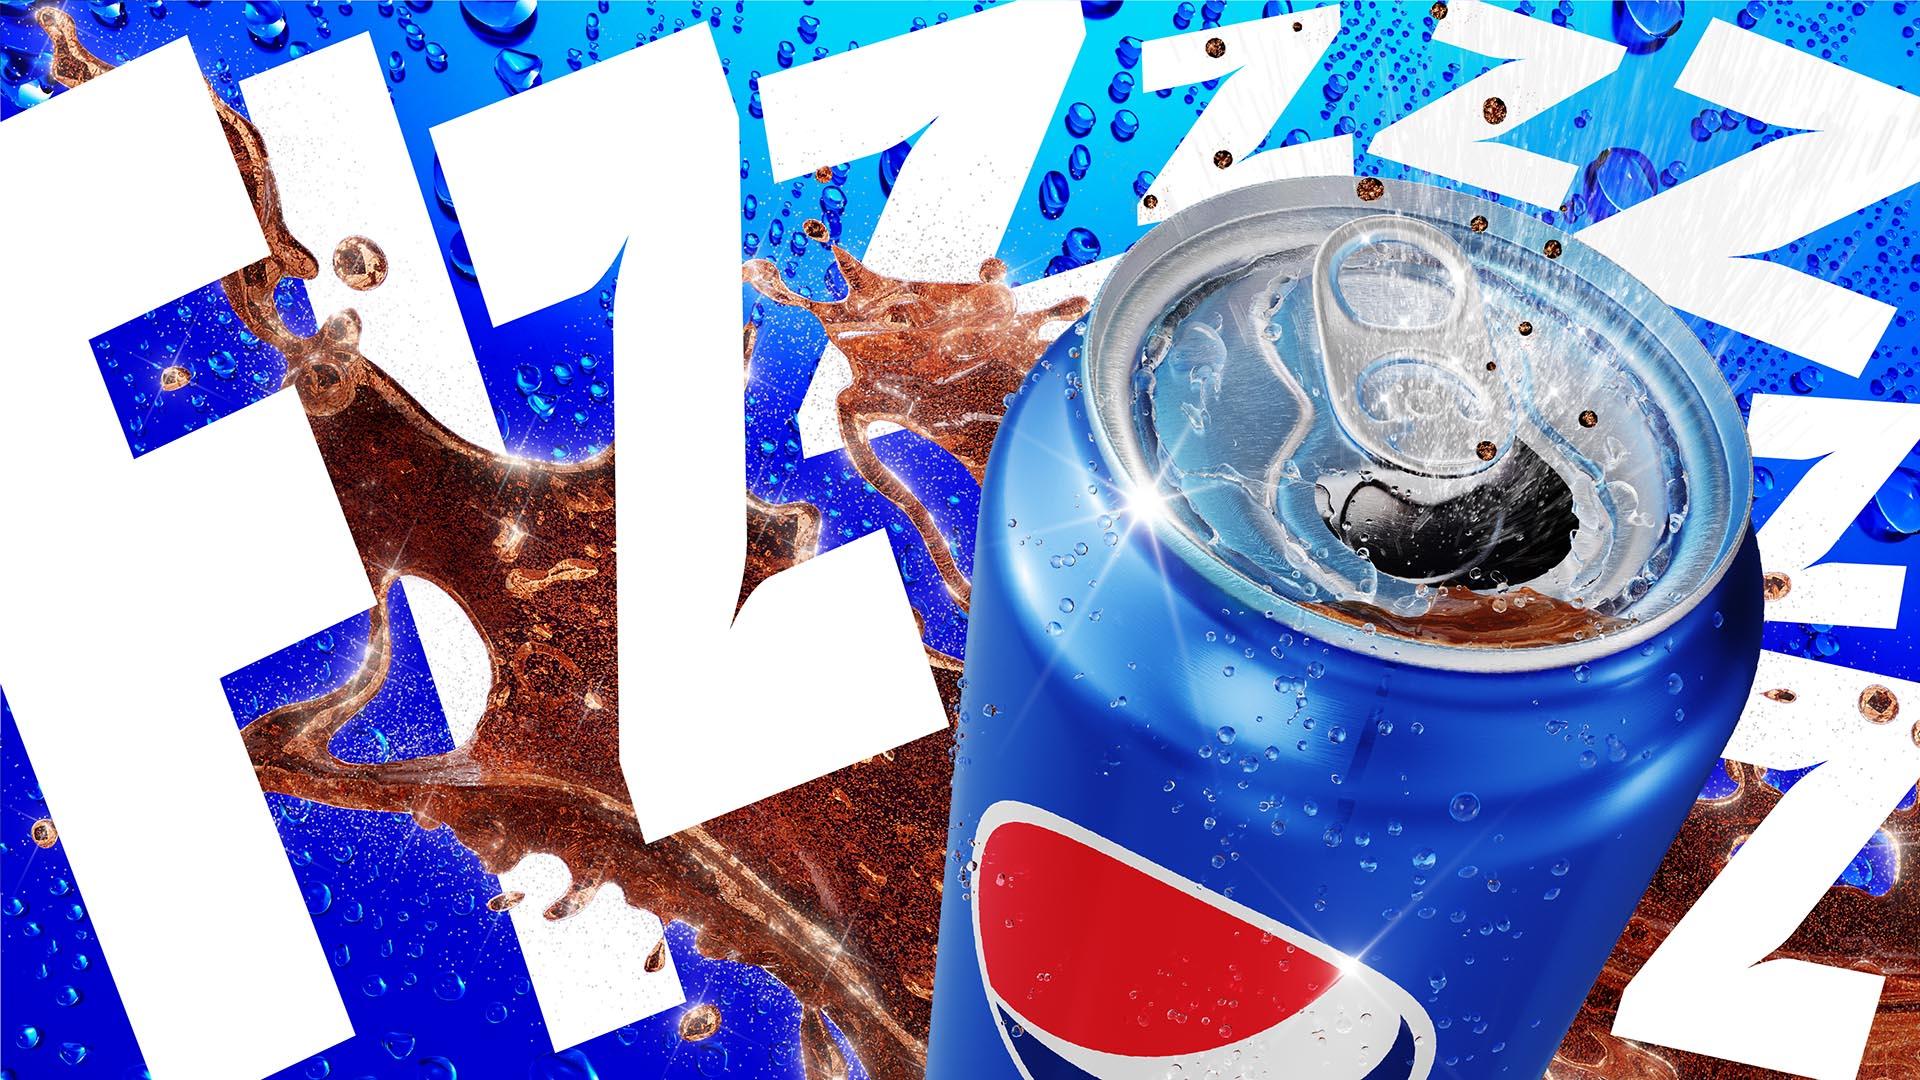 Pepsi 'PopFizzAhh'